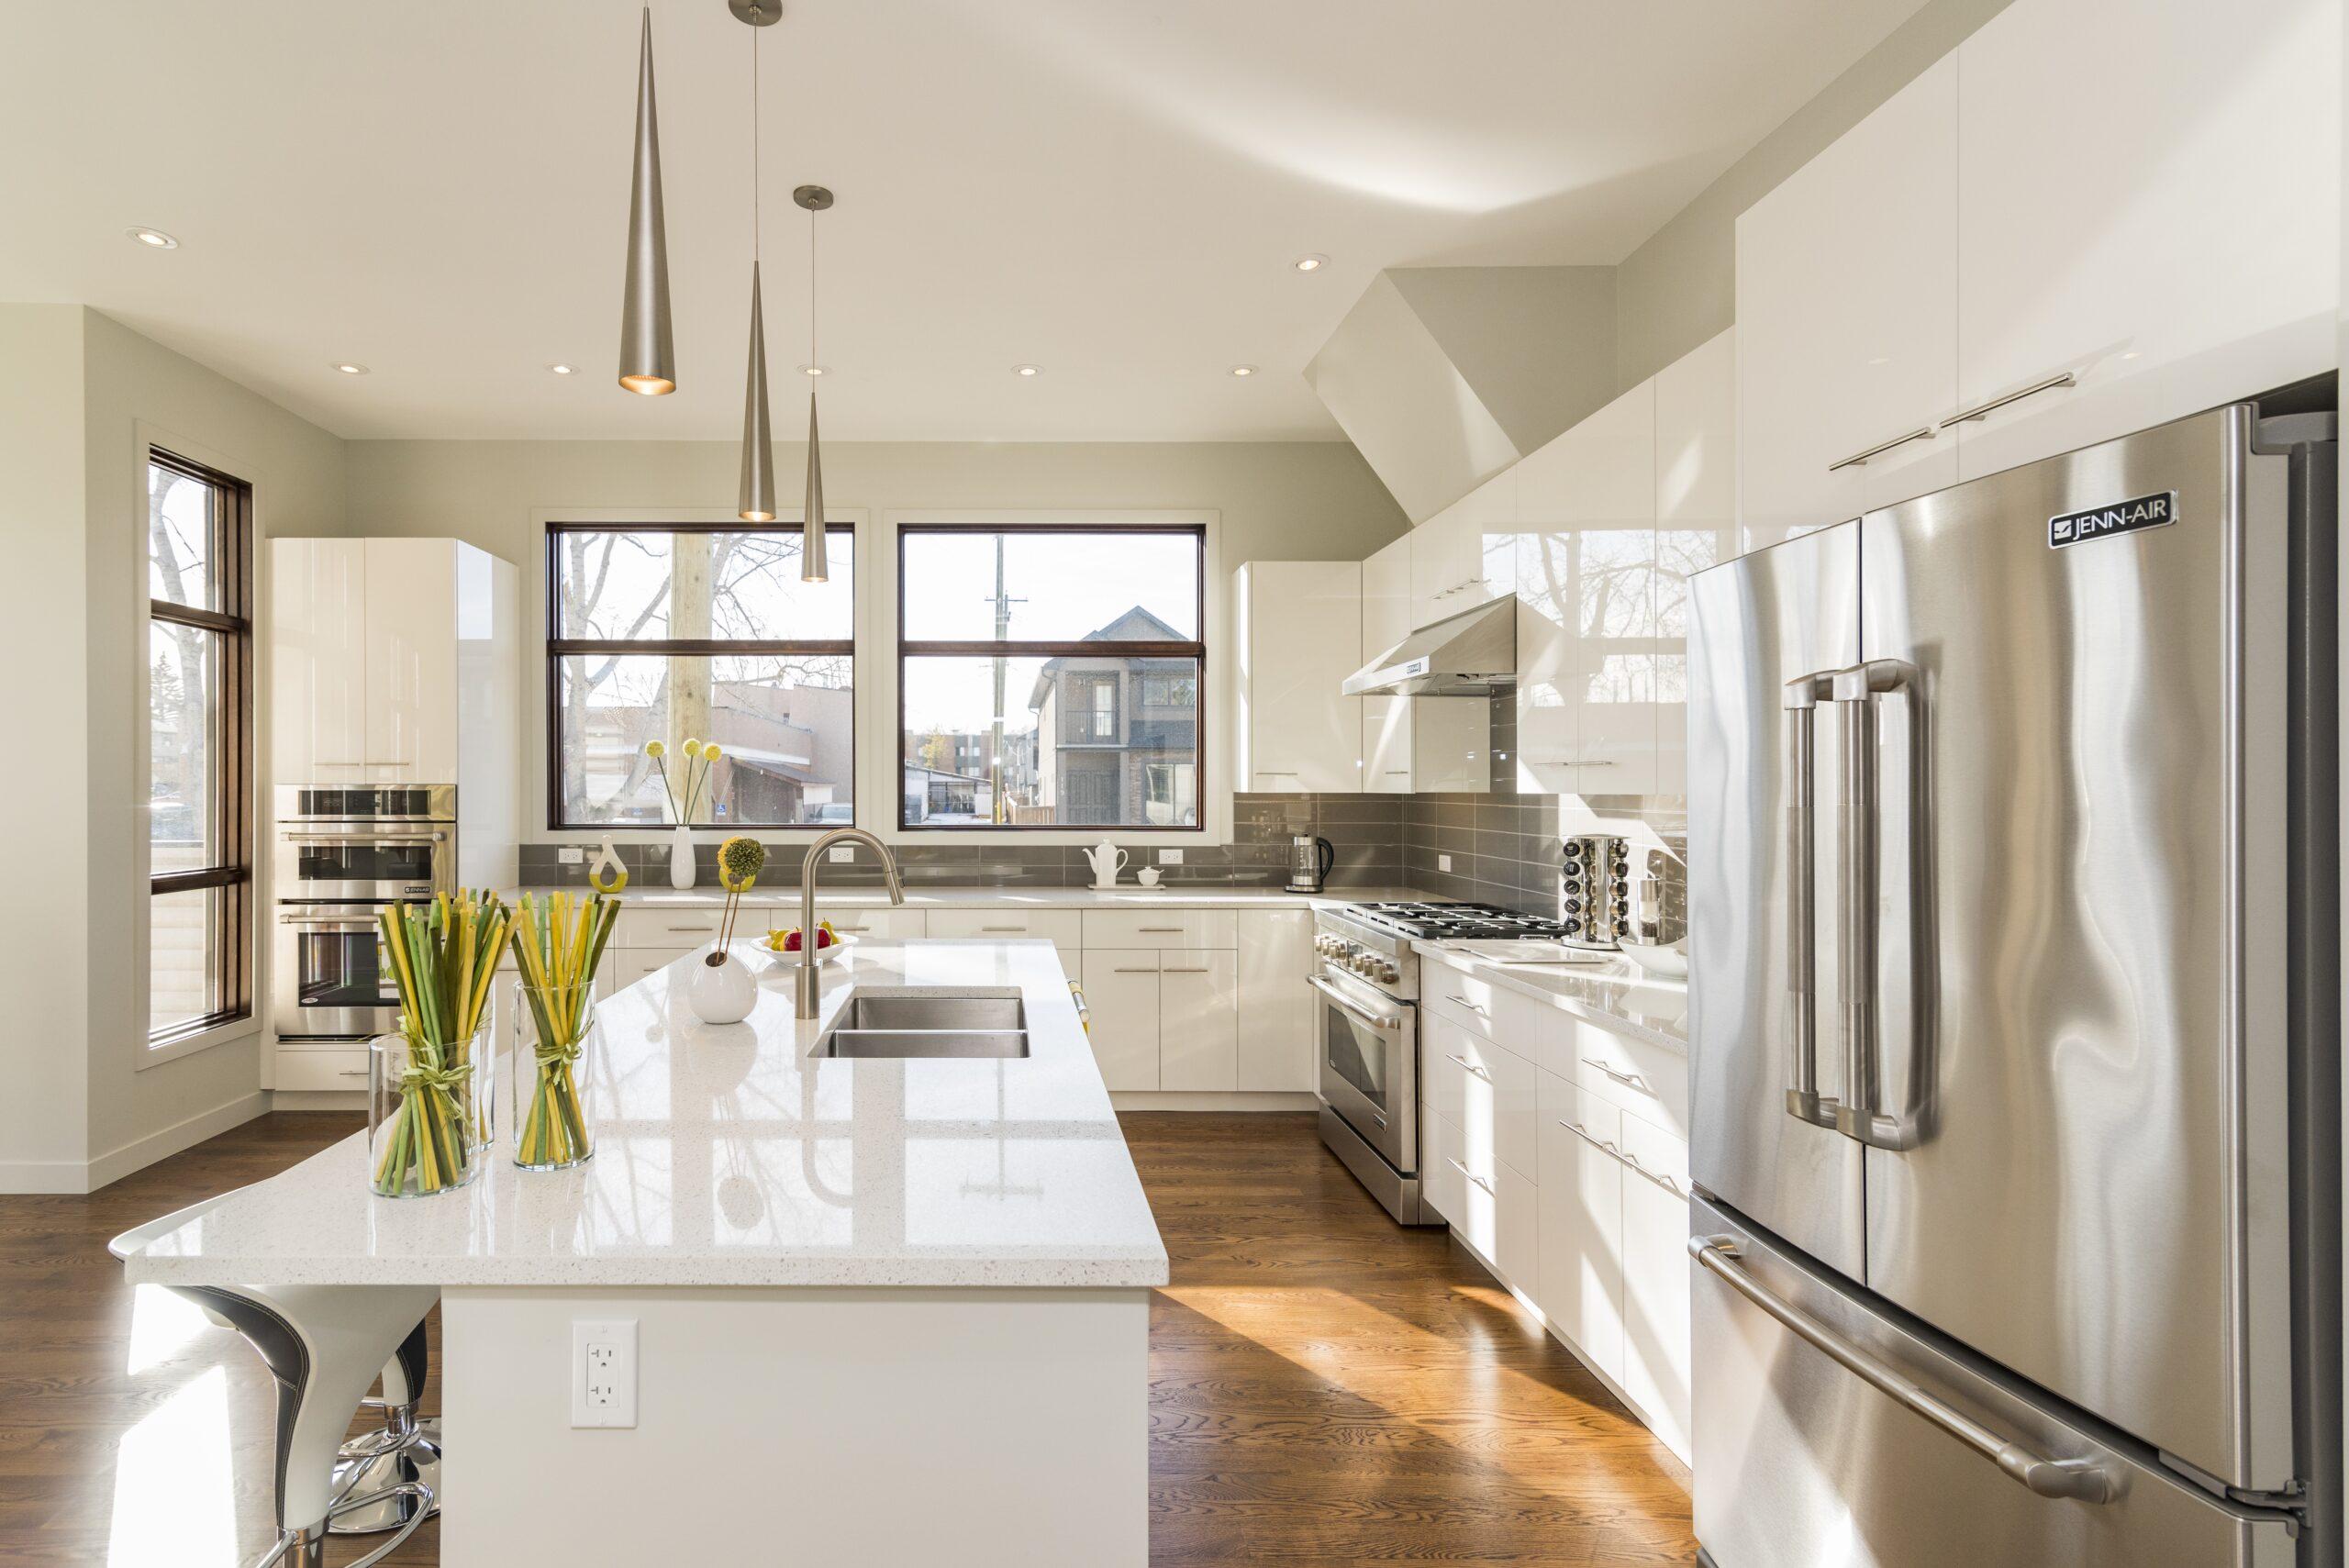 A beautiful shot of a modern house kitchen